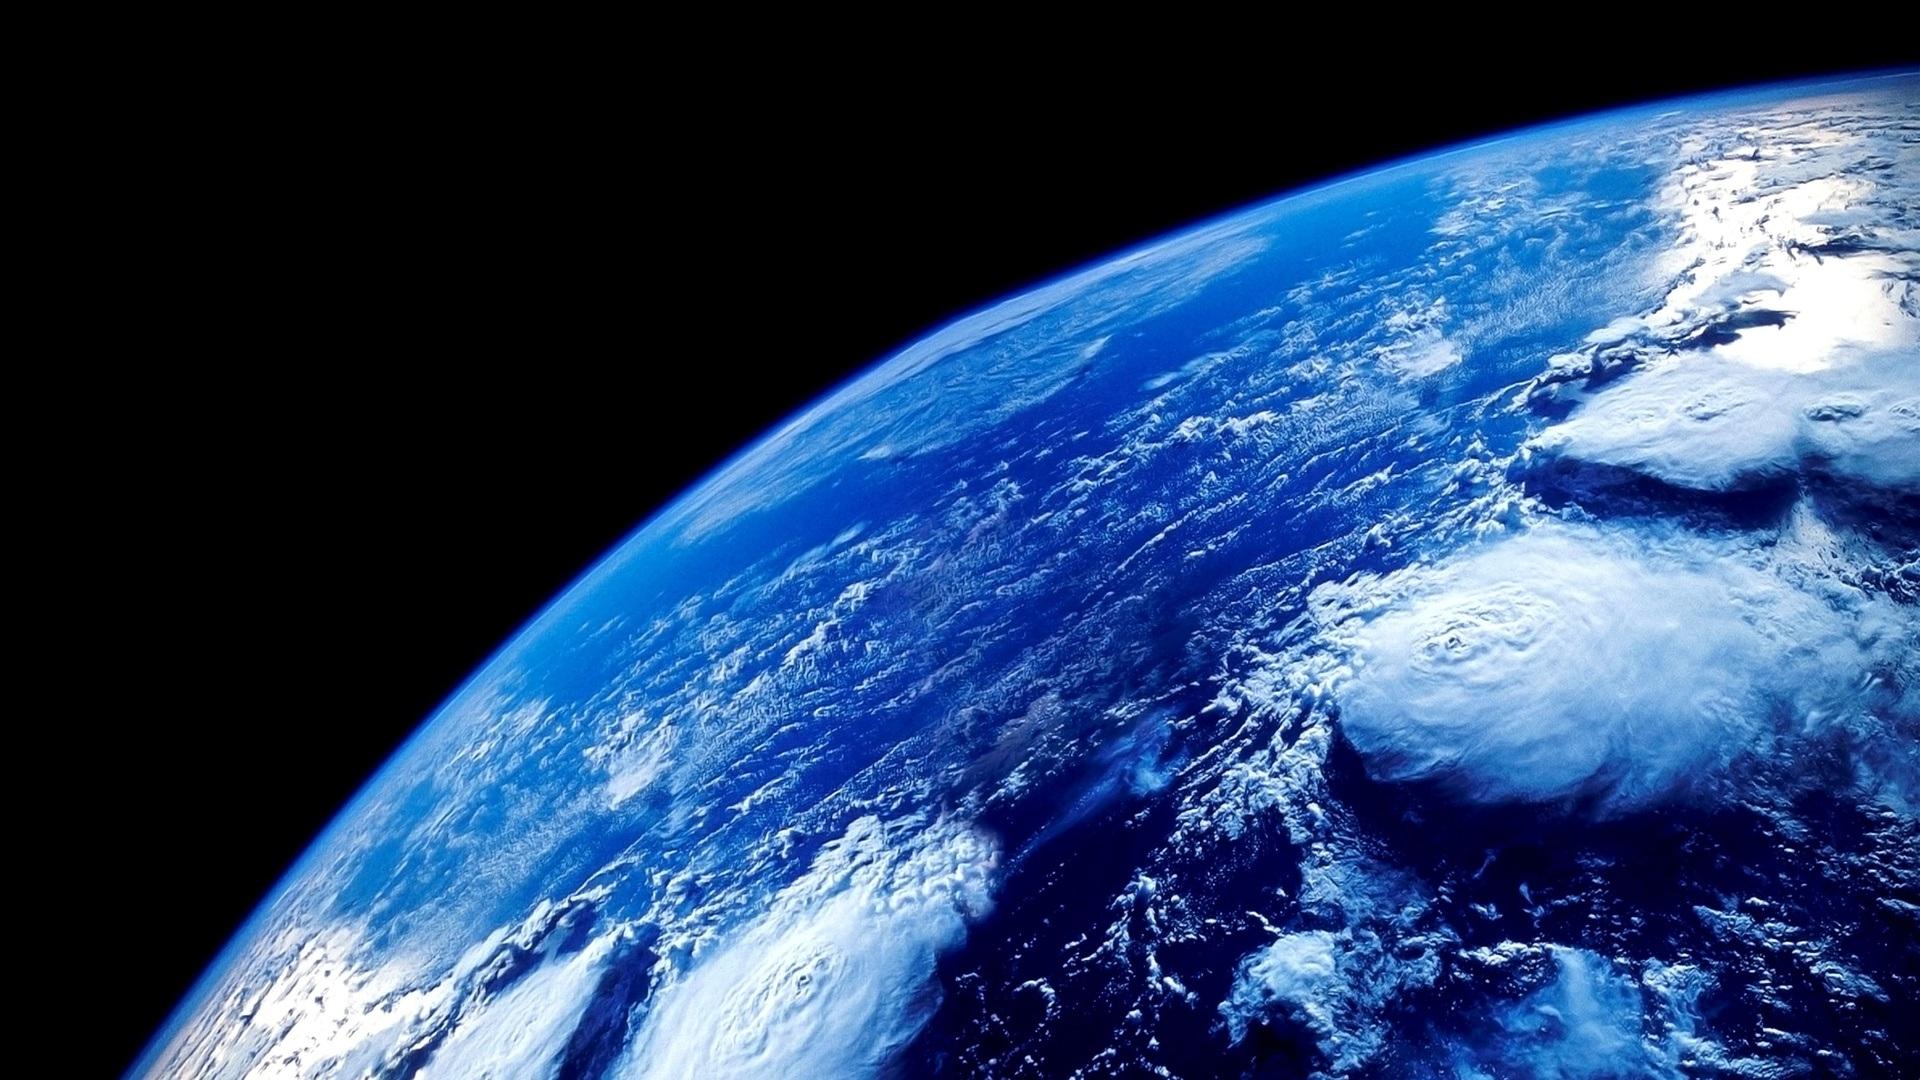 The Blue Planet 4fc C25